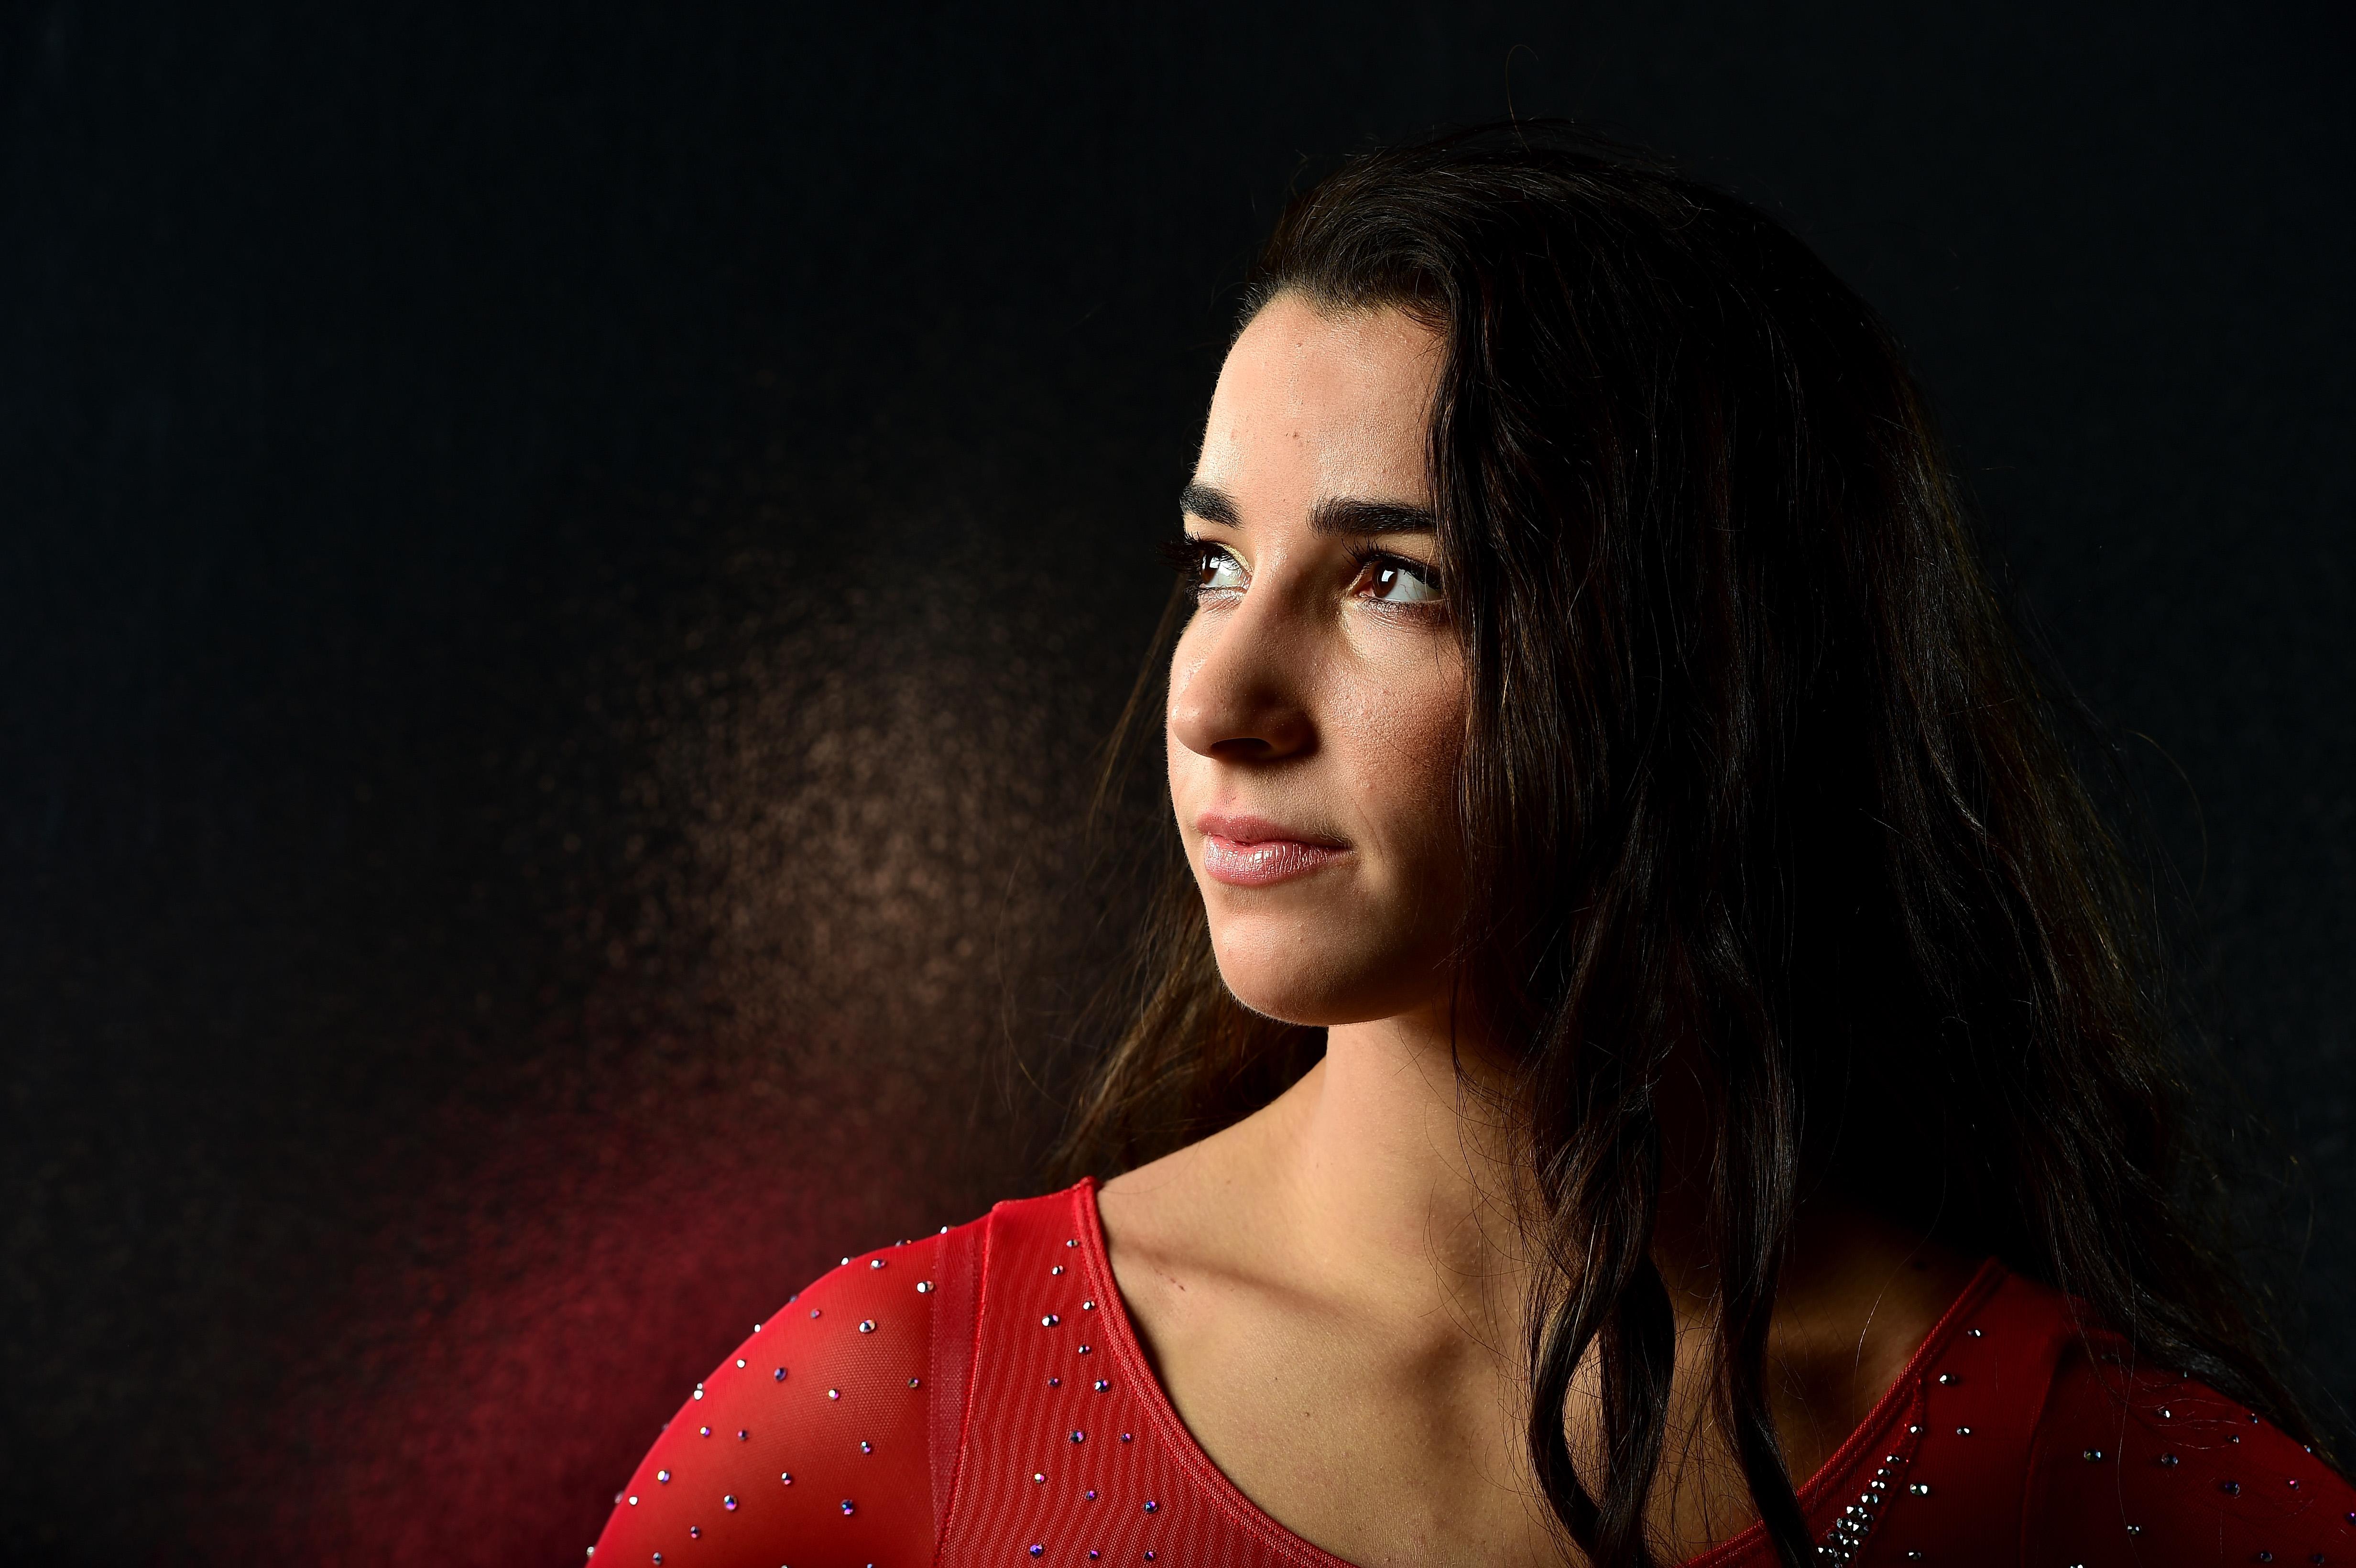 USOC Portraits for Rio2016